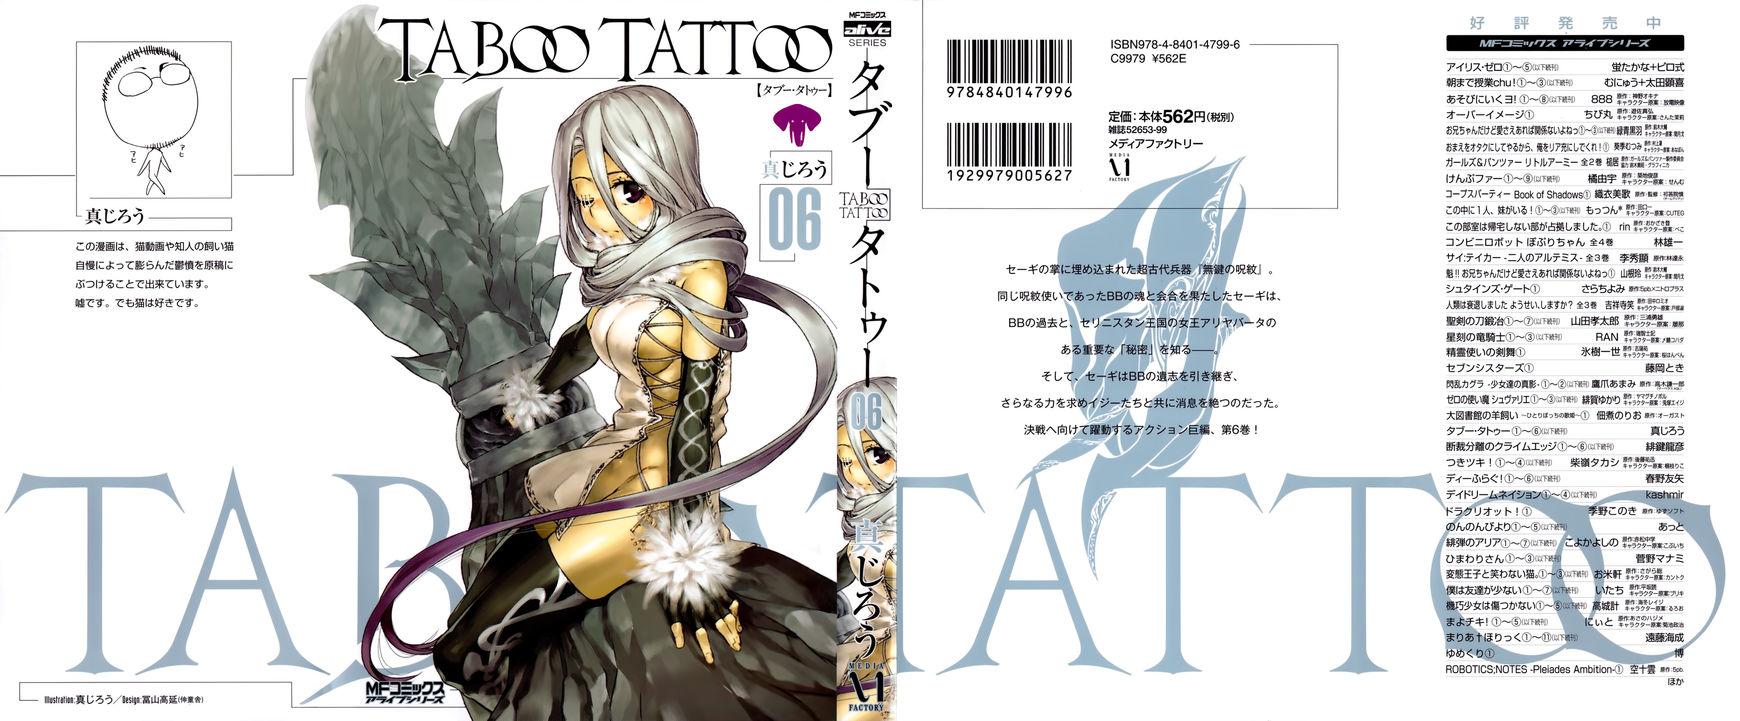 Taboo-Tattoo 28 Page 2